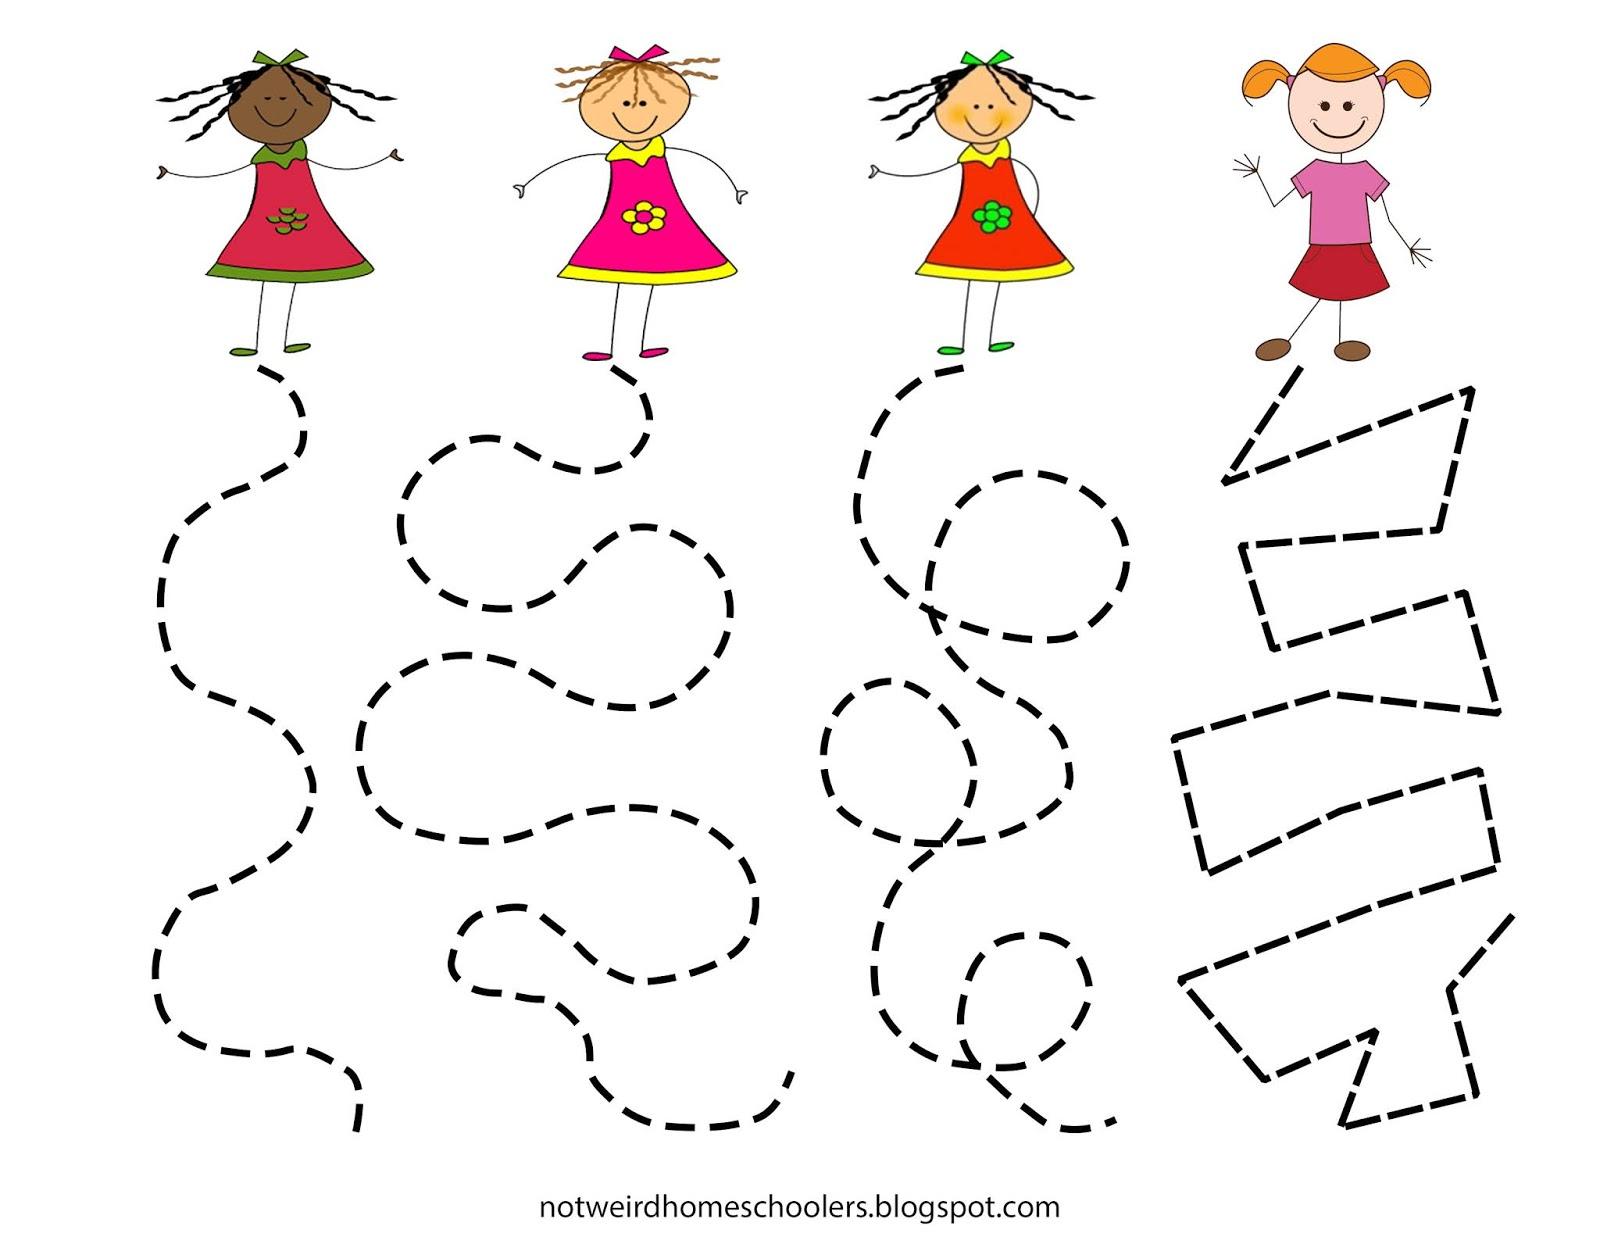 Free Homeschooling Resource Girl Tracks